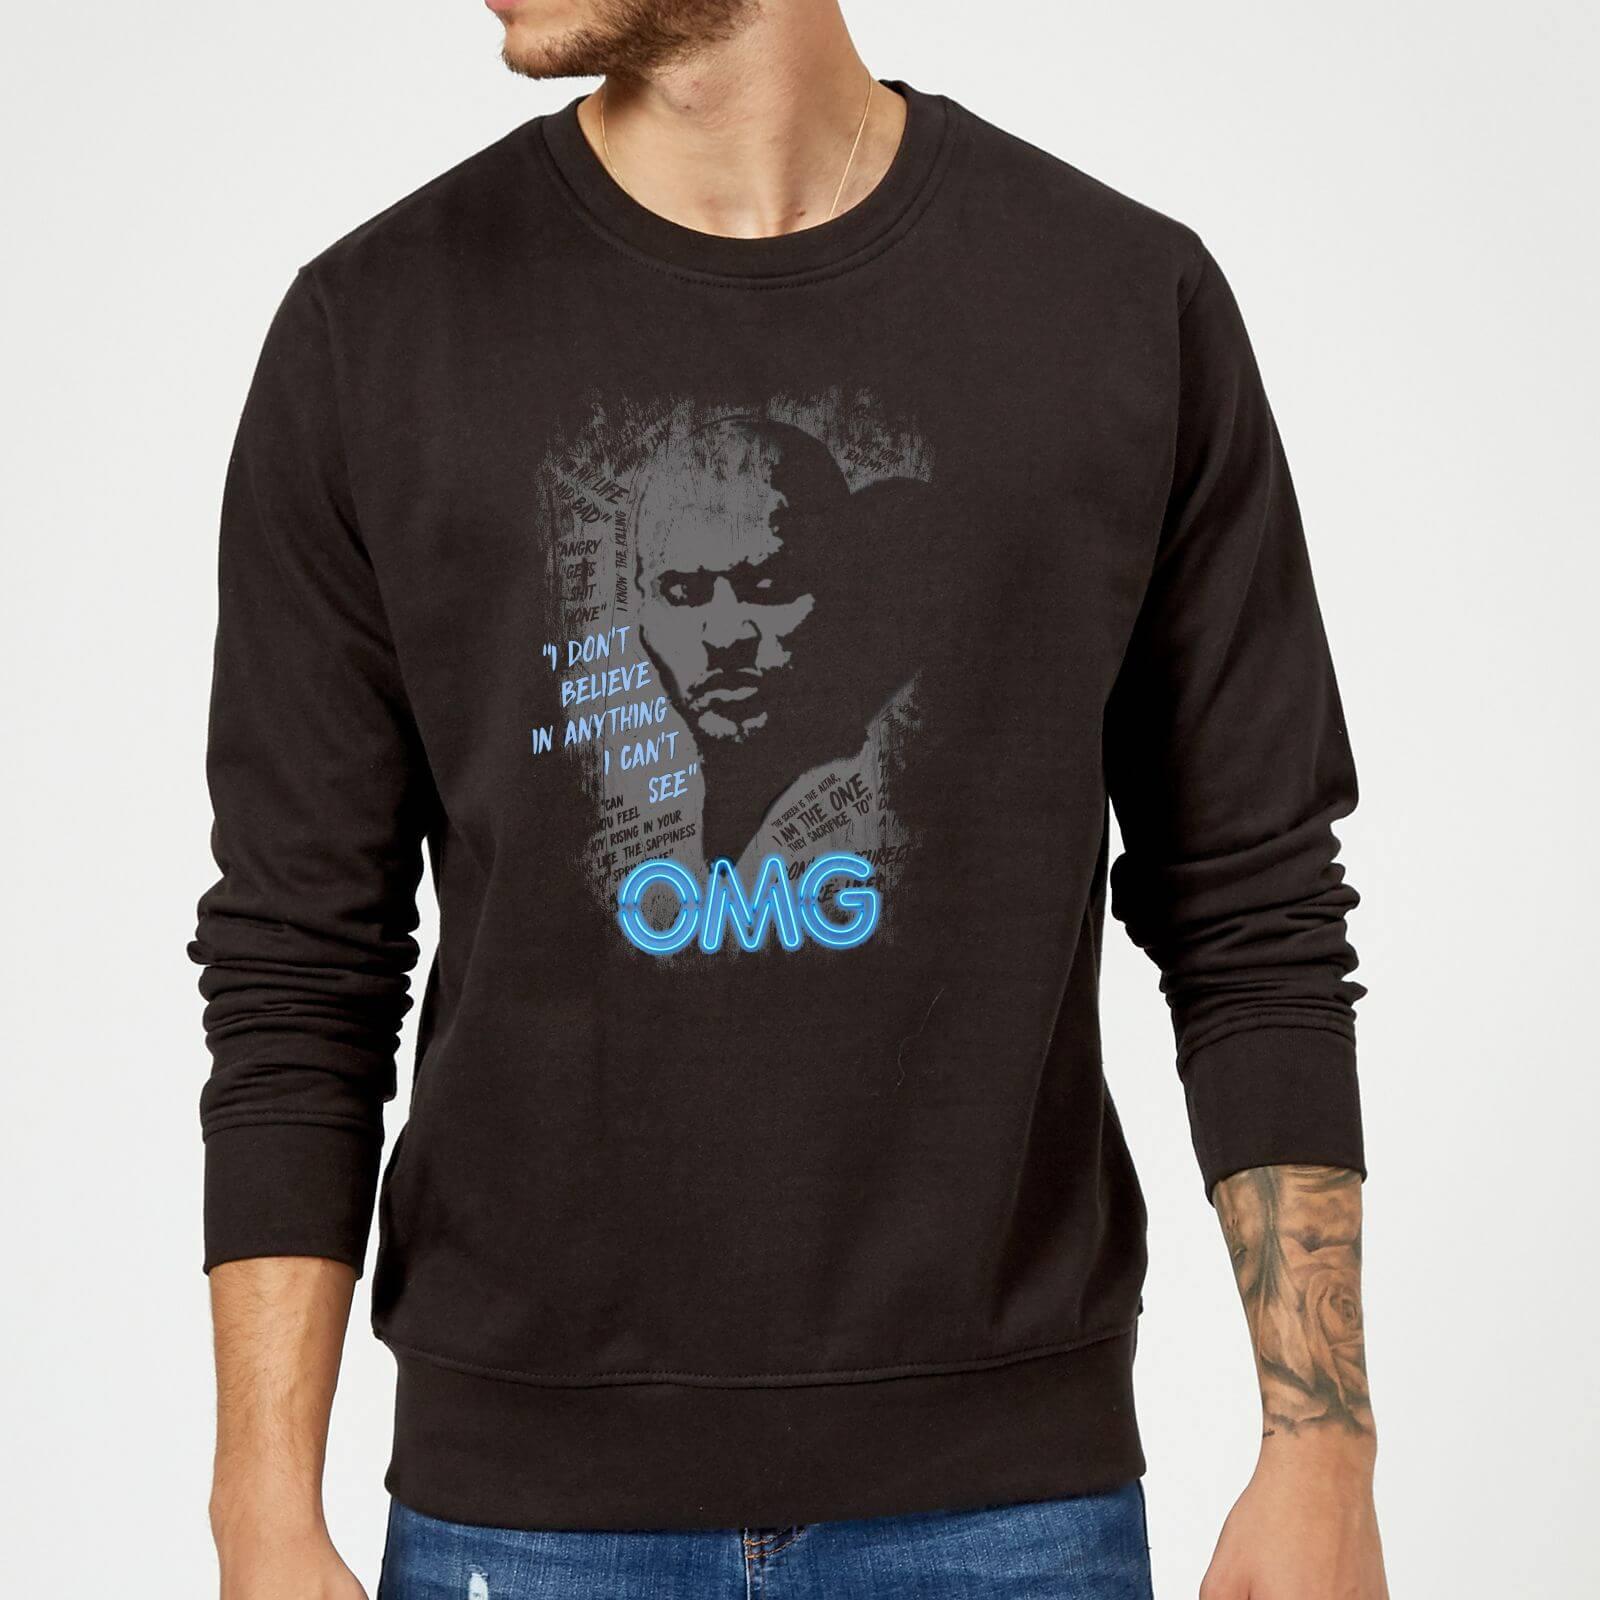 American Gods Shadow OMG Sweatshirt - Black - M - Black